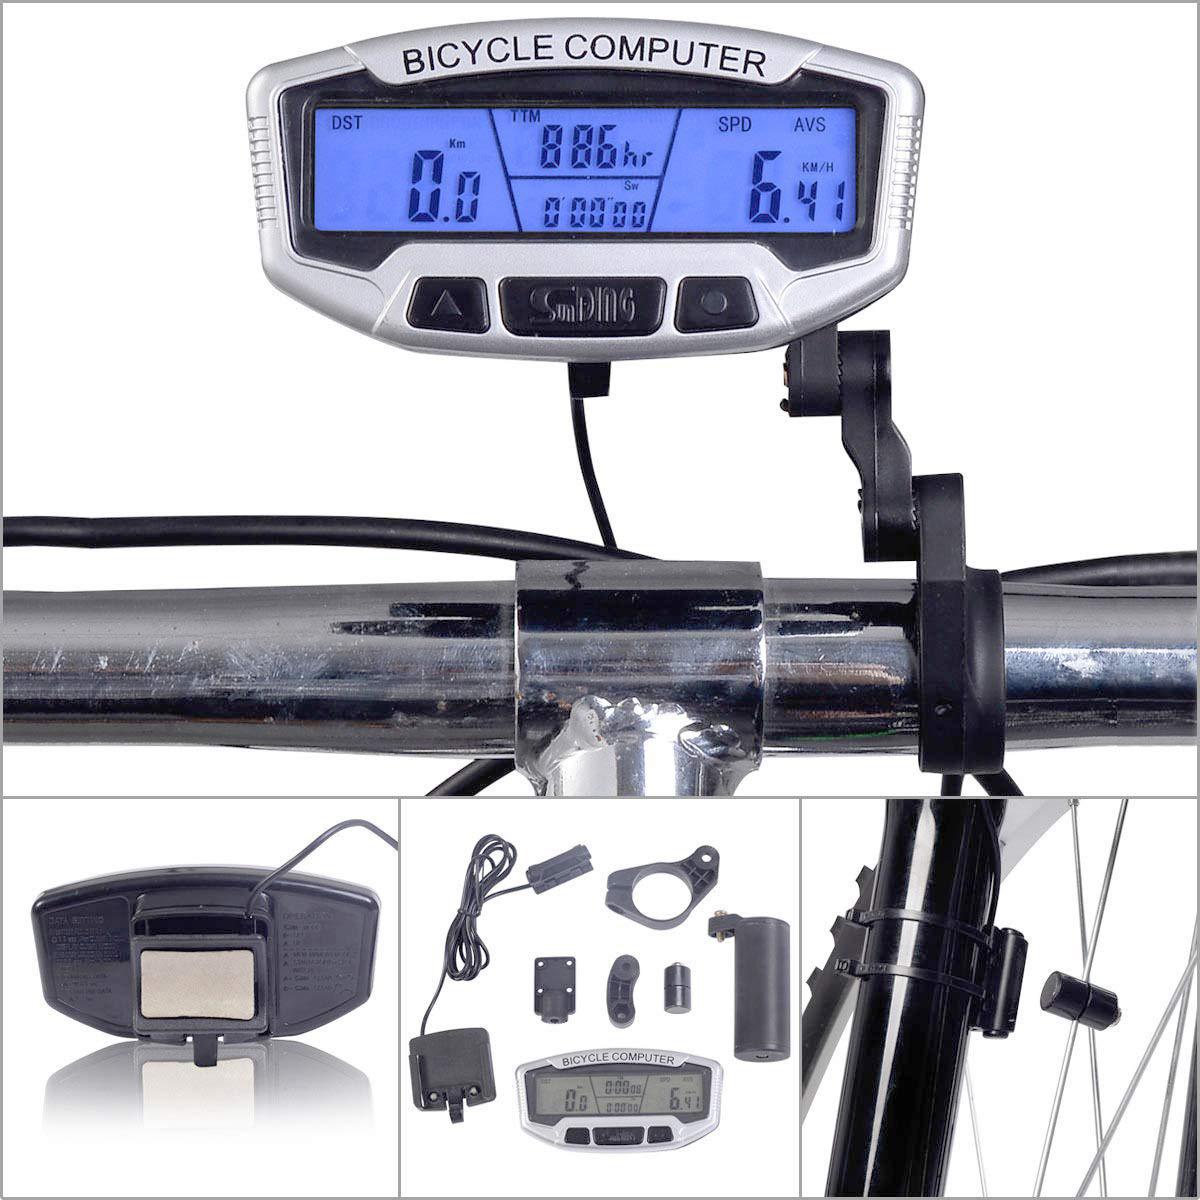 Cyclometers